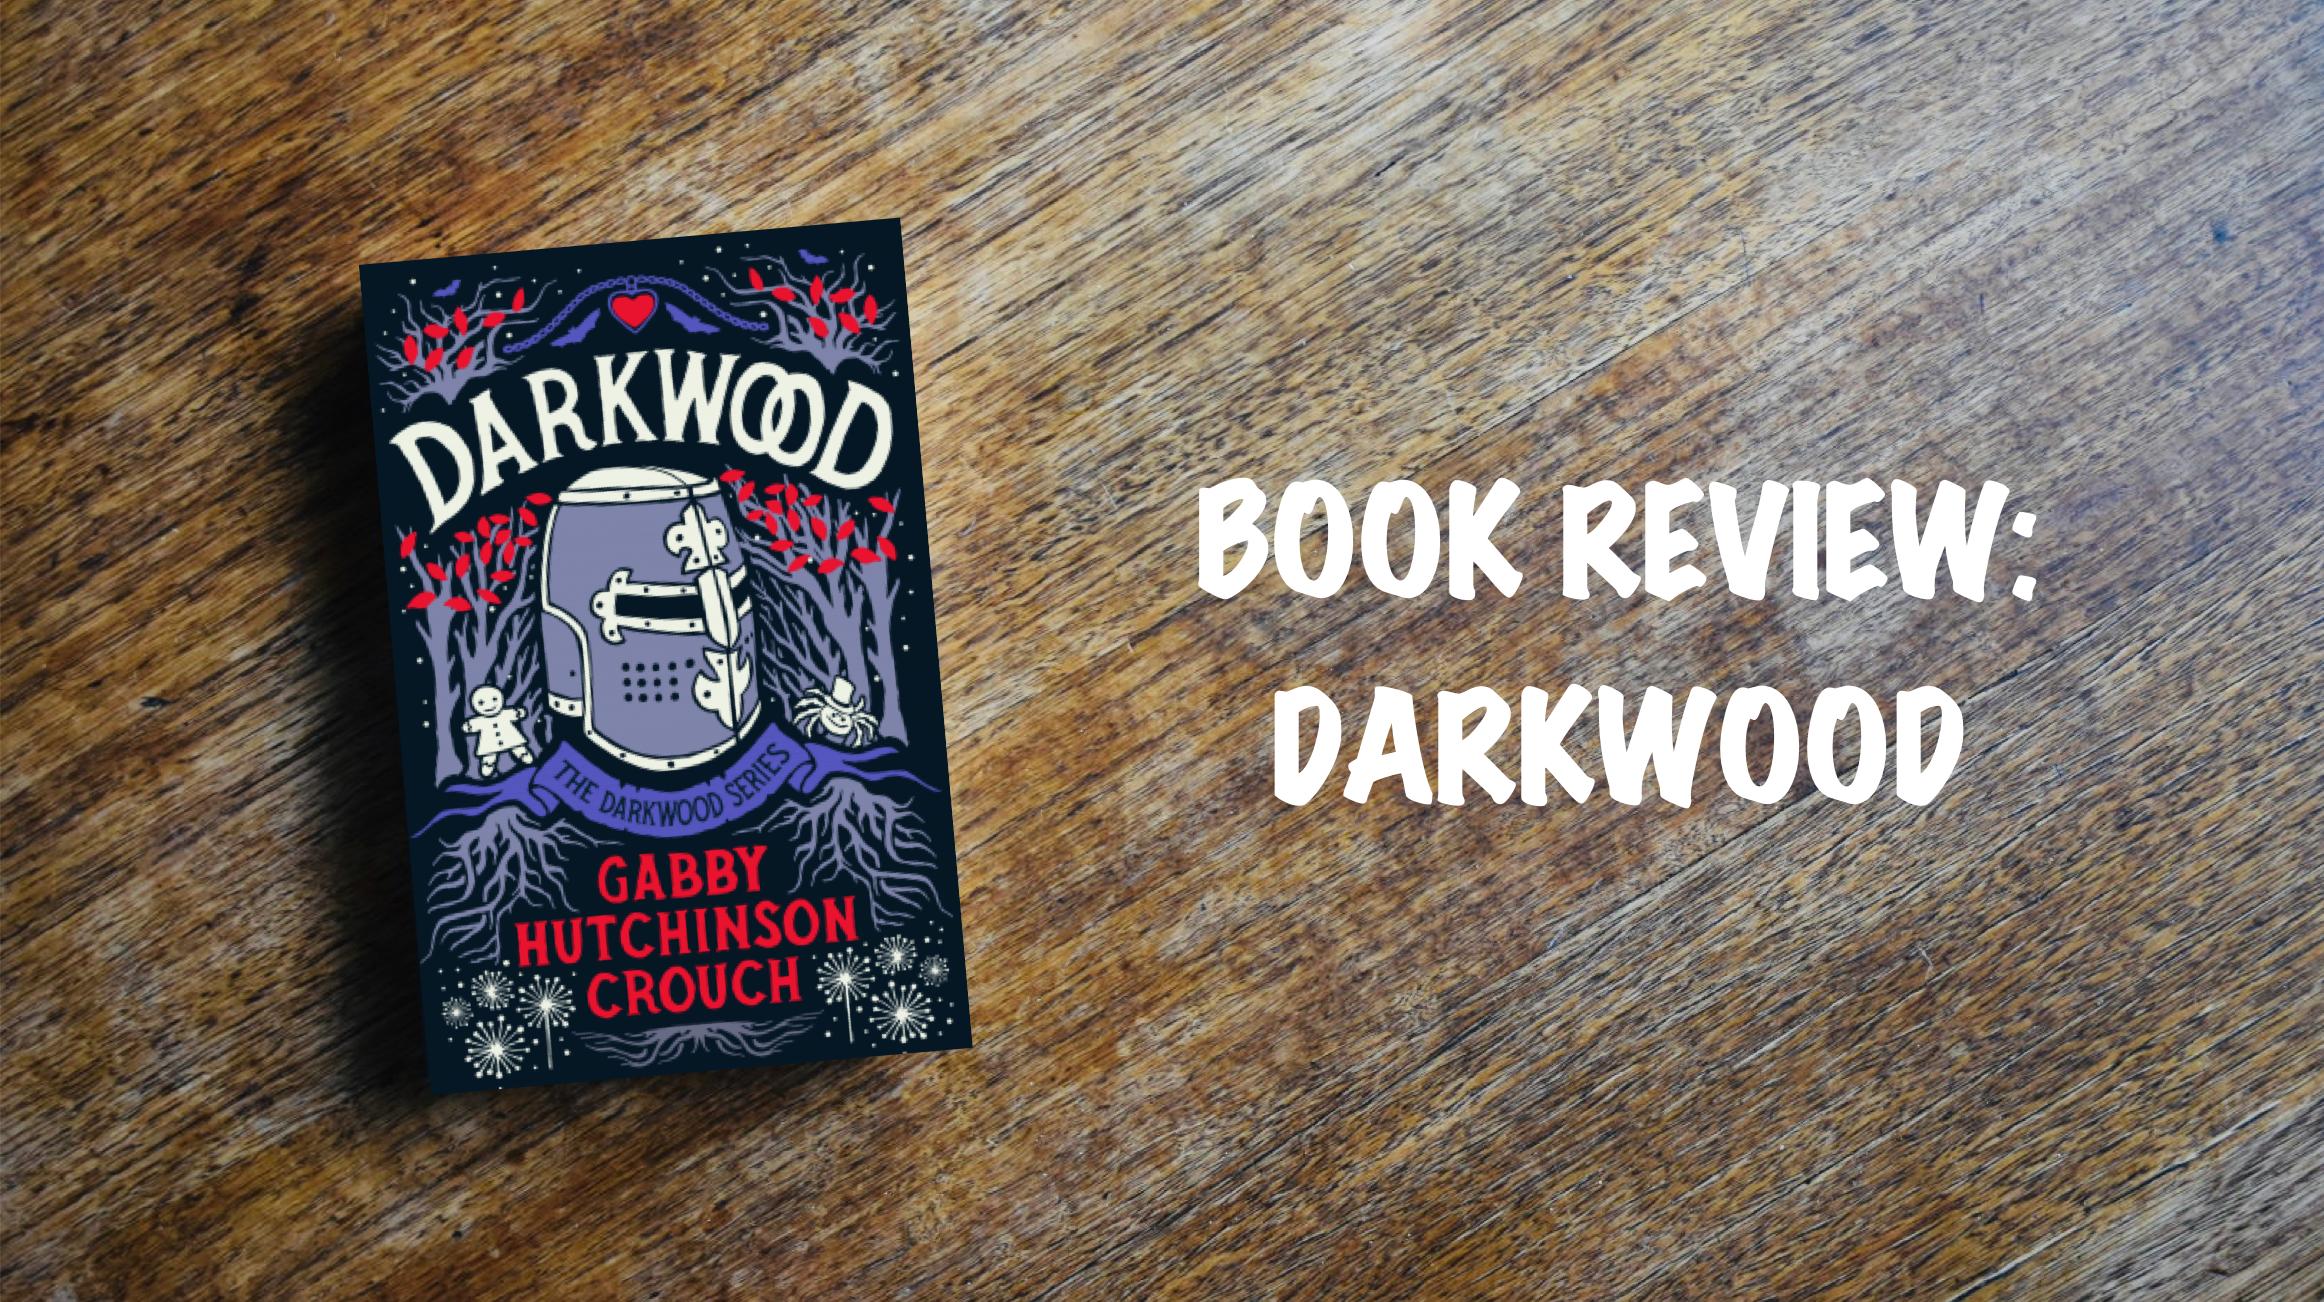 Book review banner: Darkwood